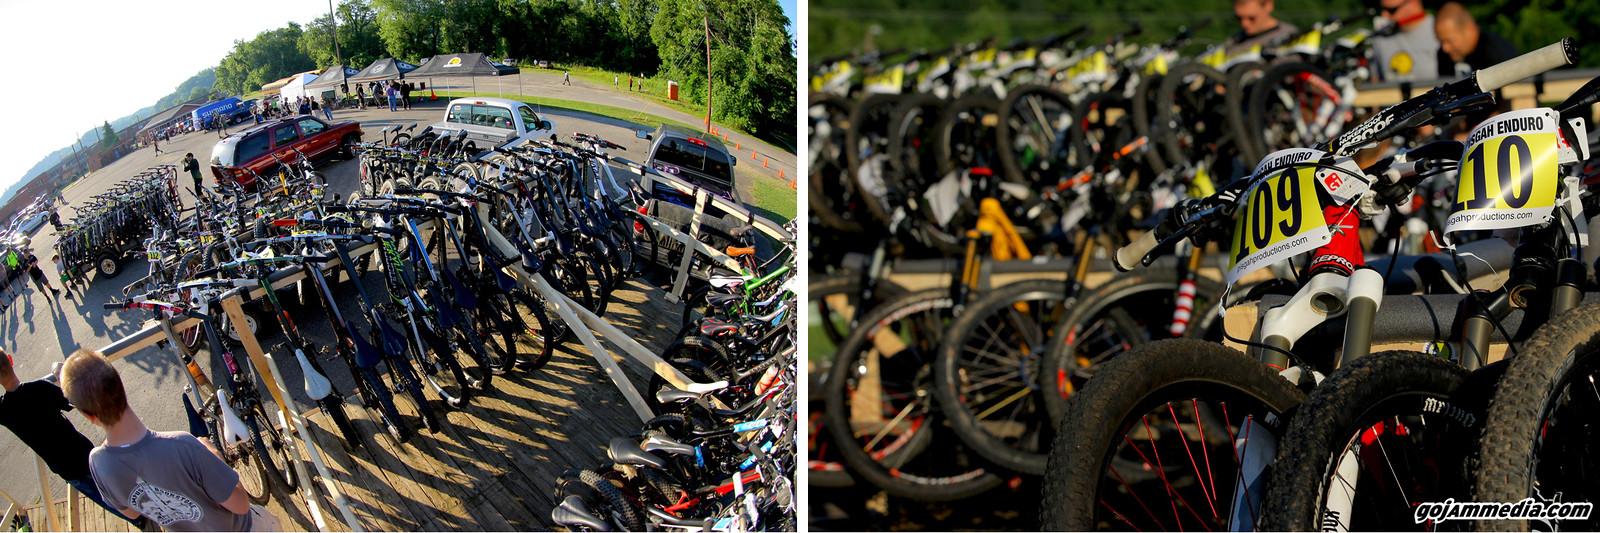 What Half a Million Dollars Looks Like on a Weekend - gojammedia - Mountain Biking Pictures - Vital MTB